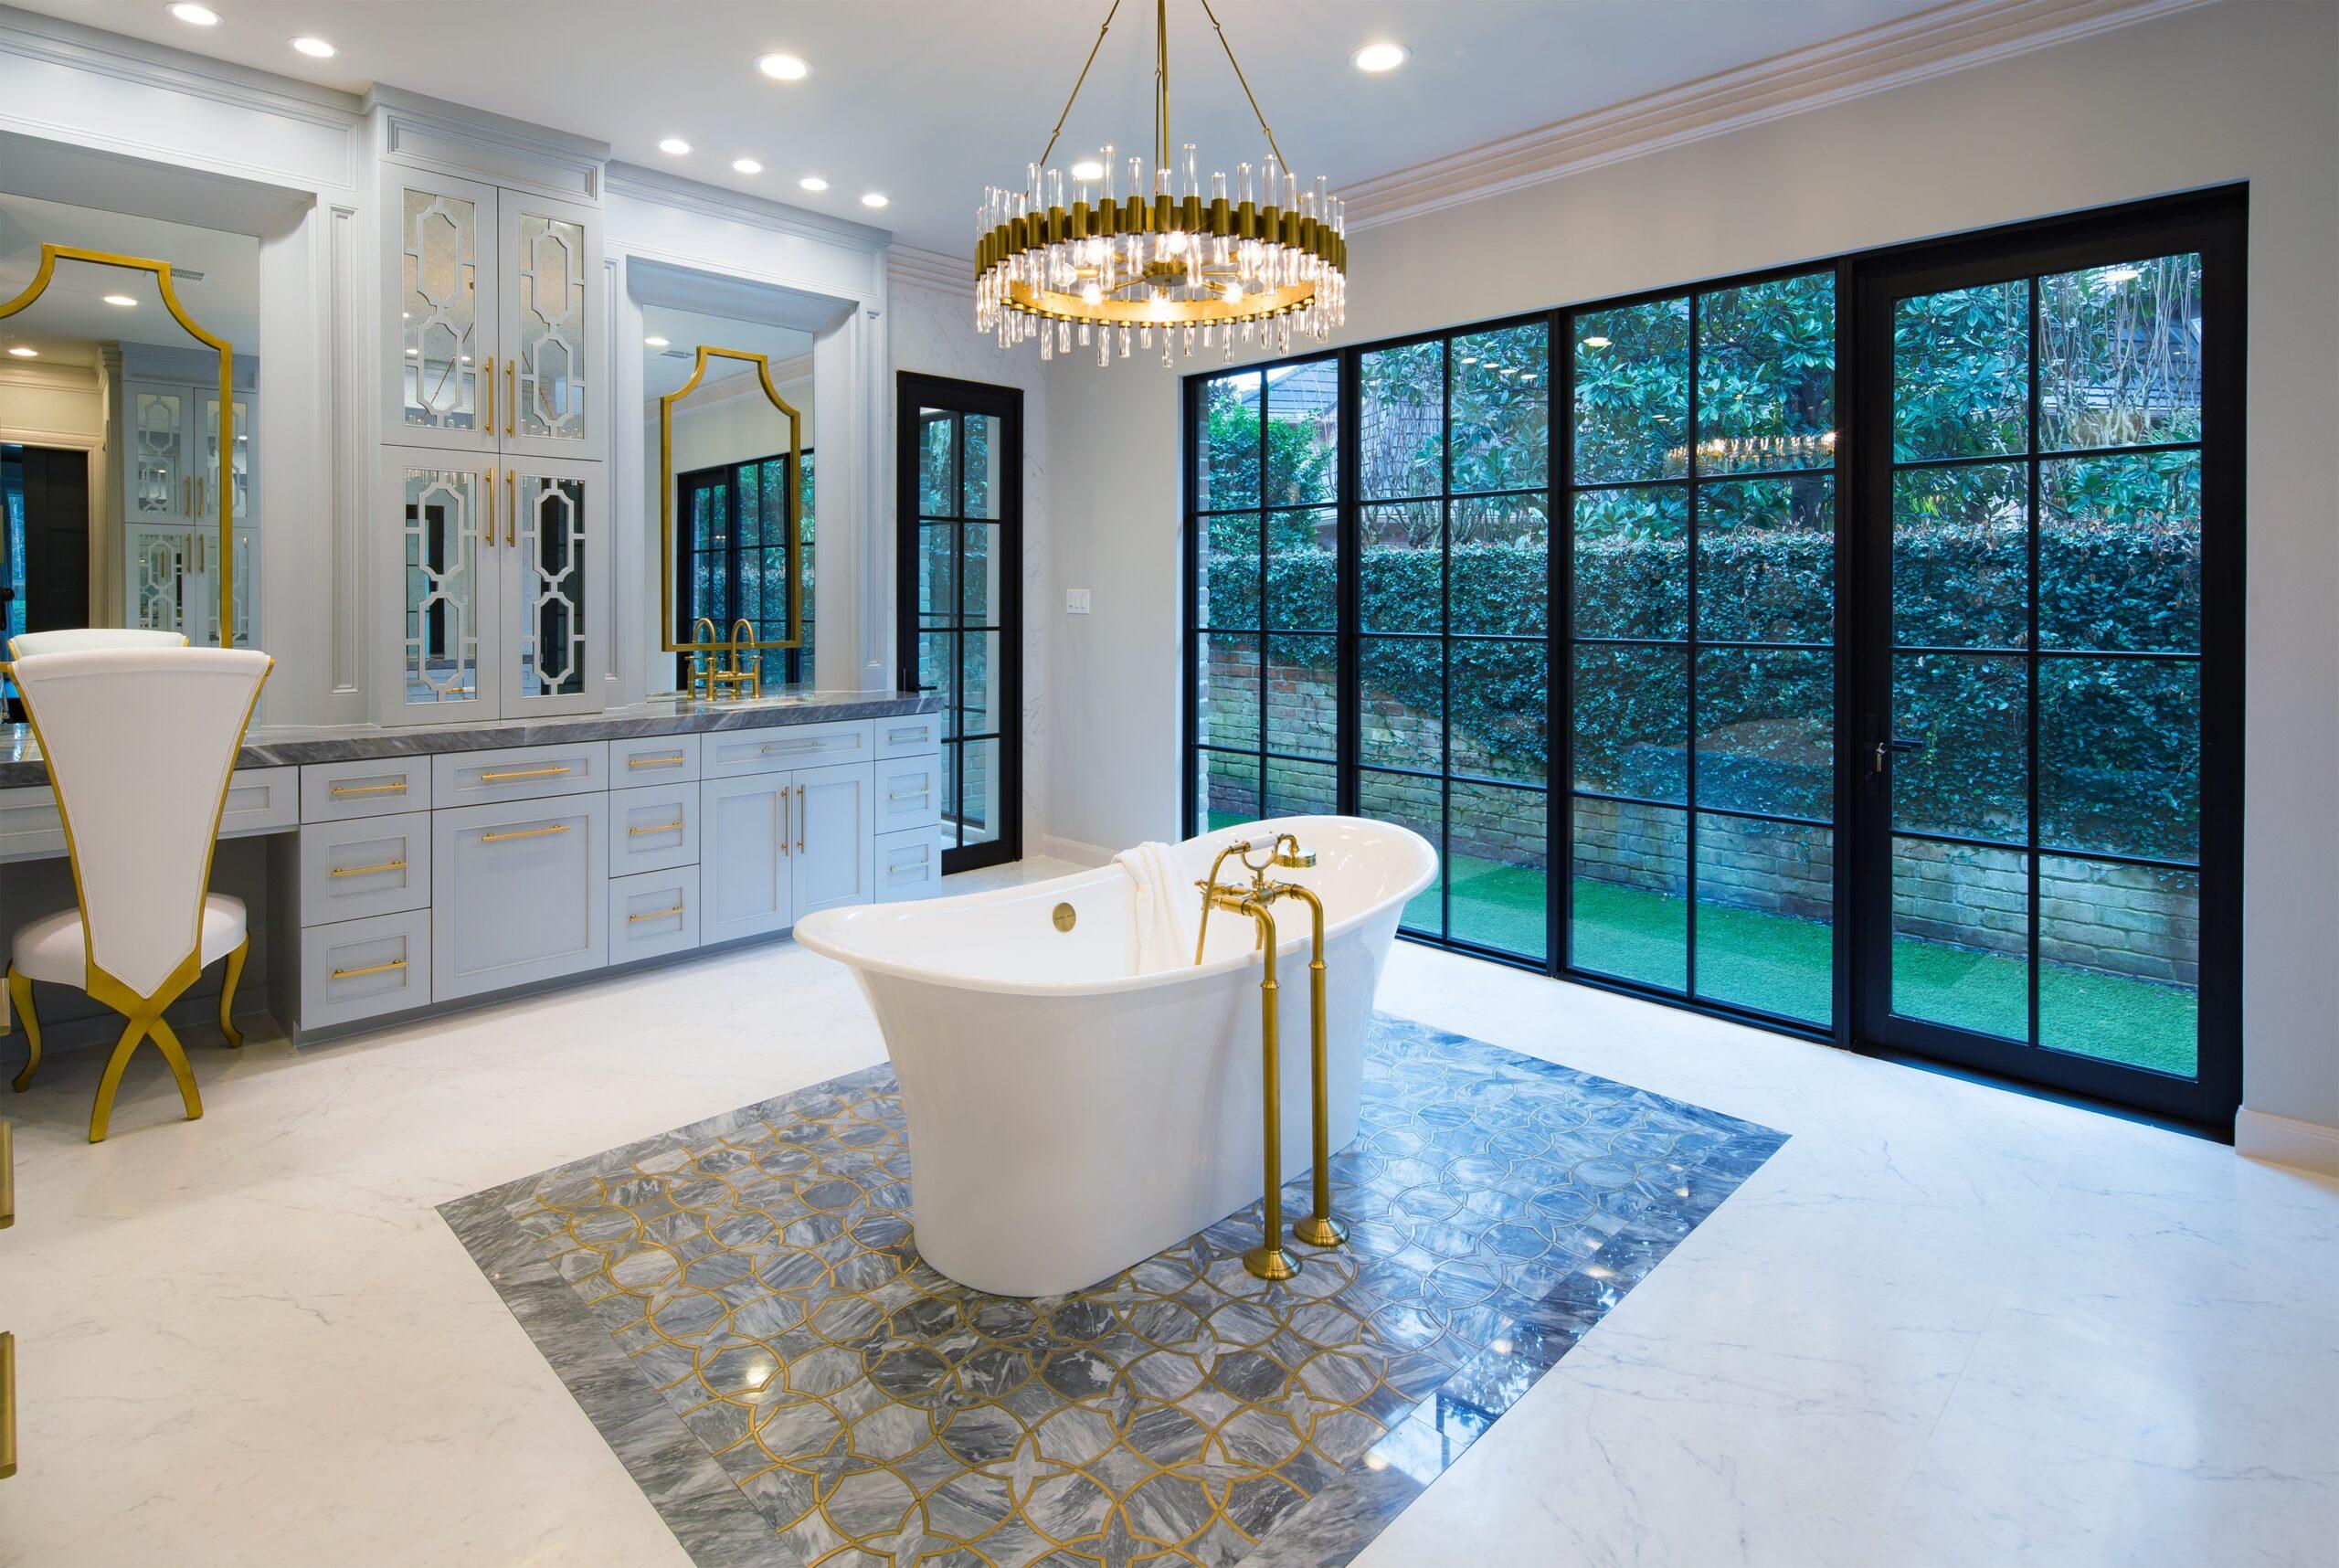 Memorial Master Suite Renovation | Residential | Houston TX 77024 & Memorial | Master Suite Renovation | Houston TX 77024 | SweetLake ...